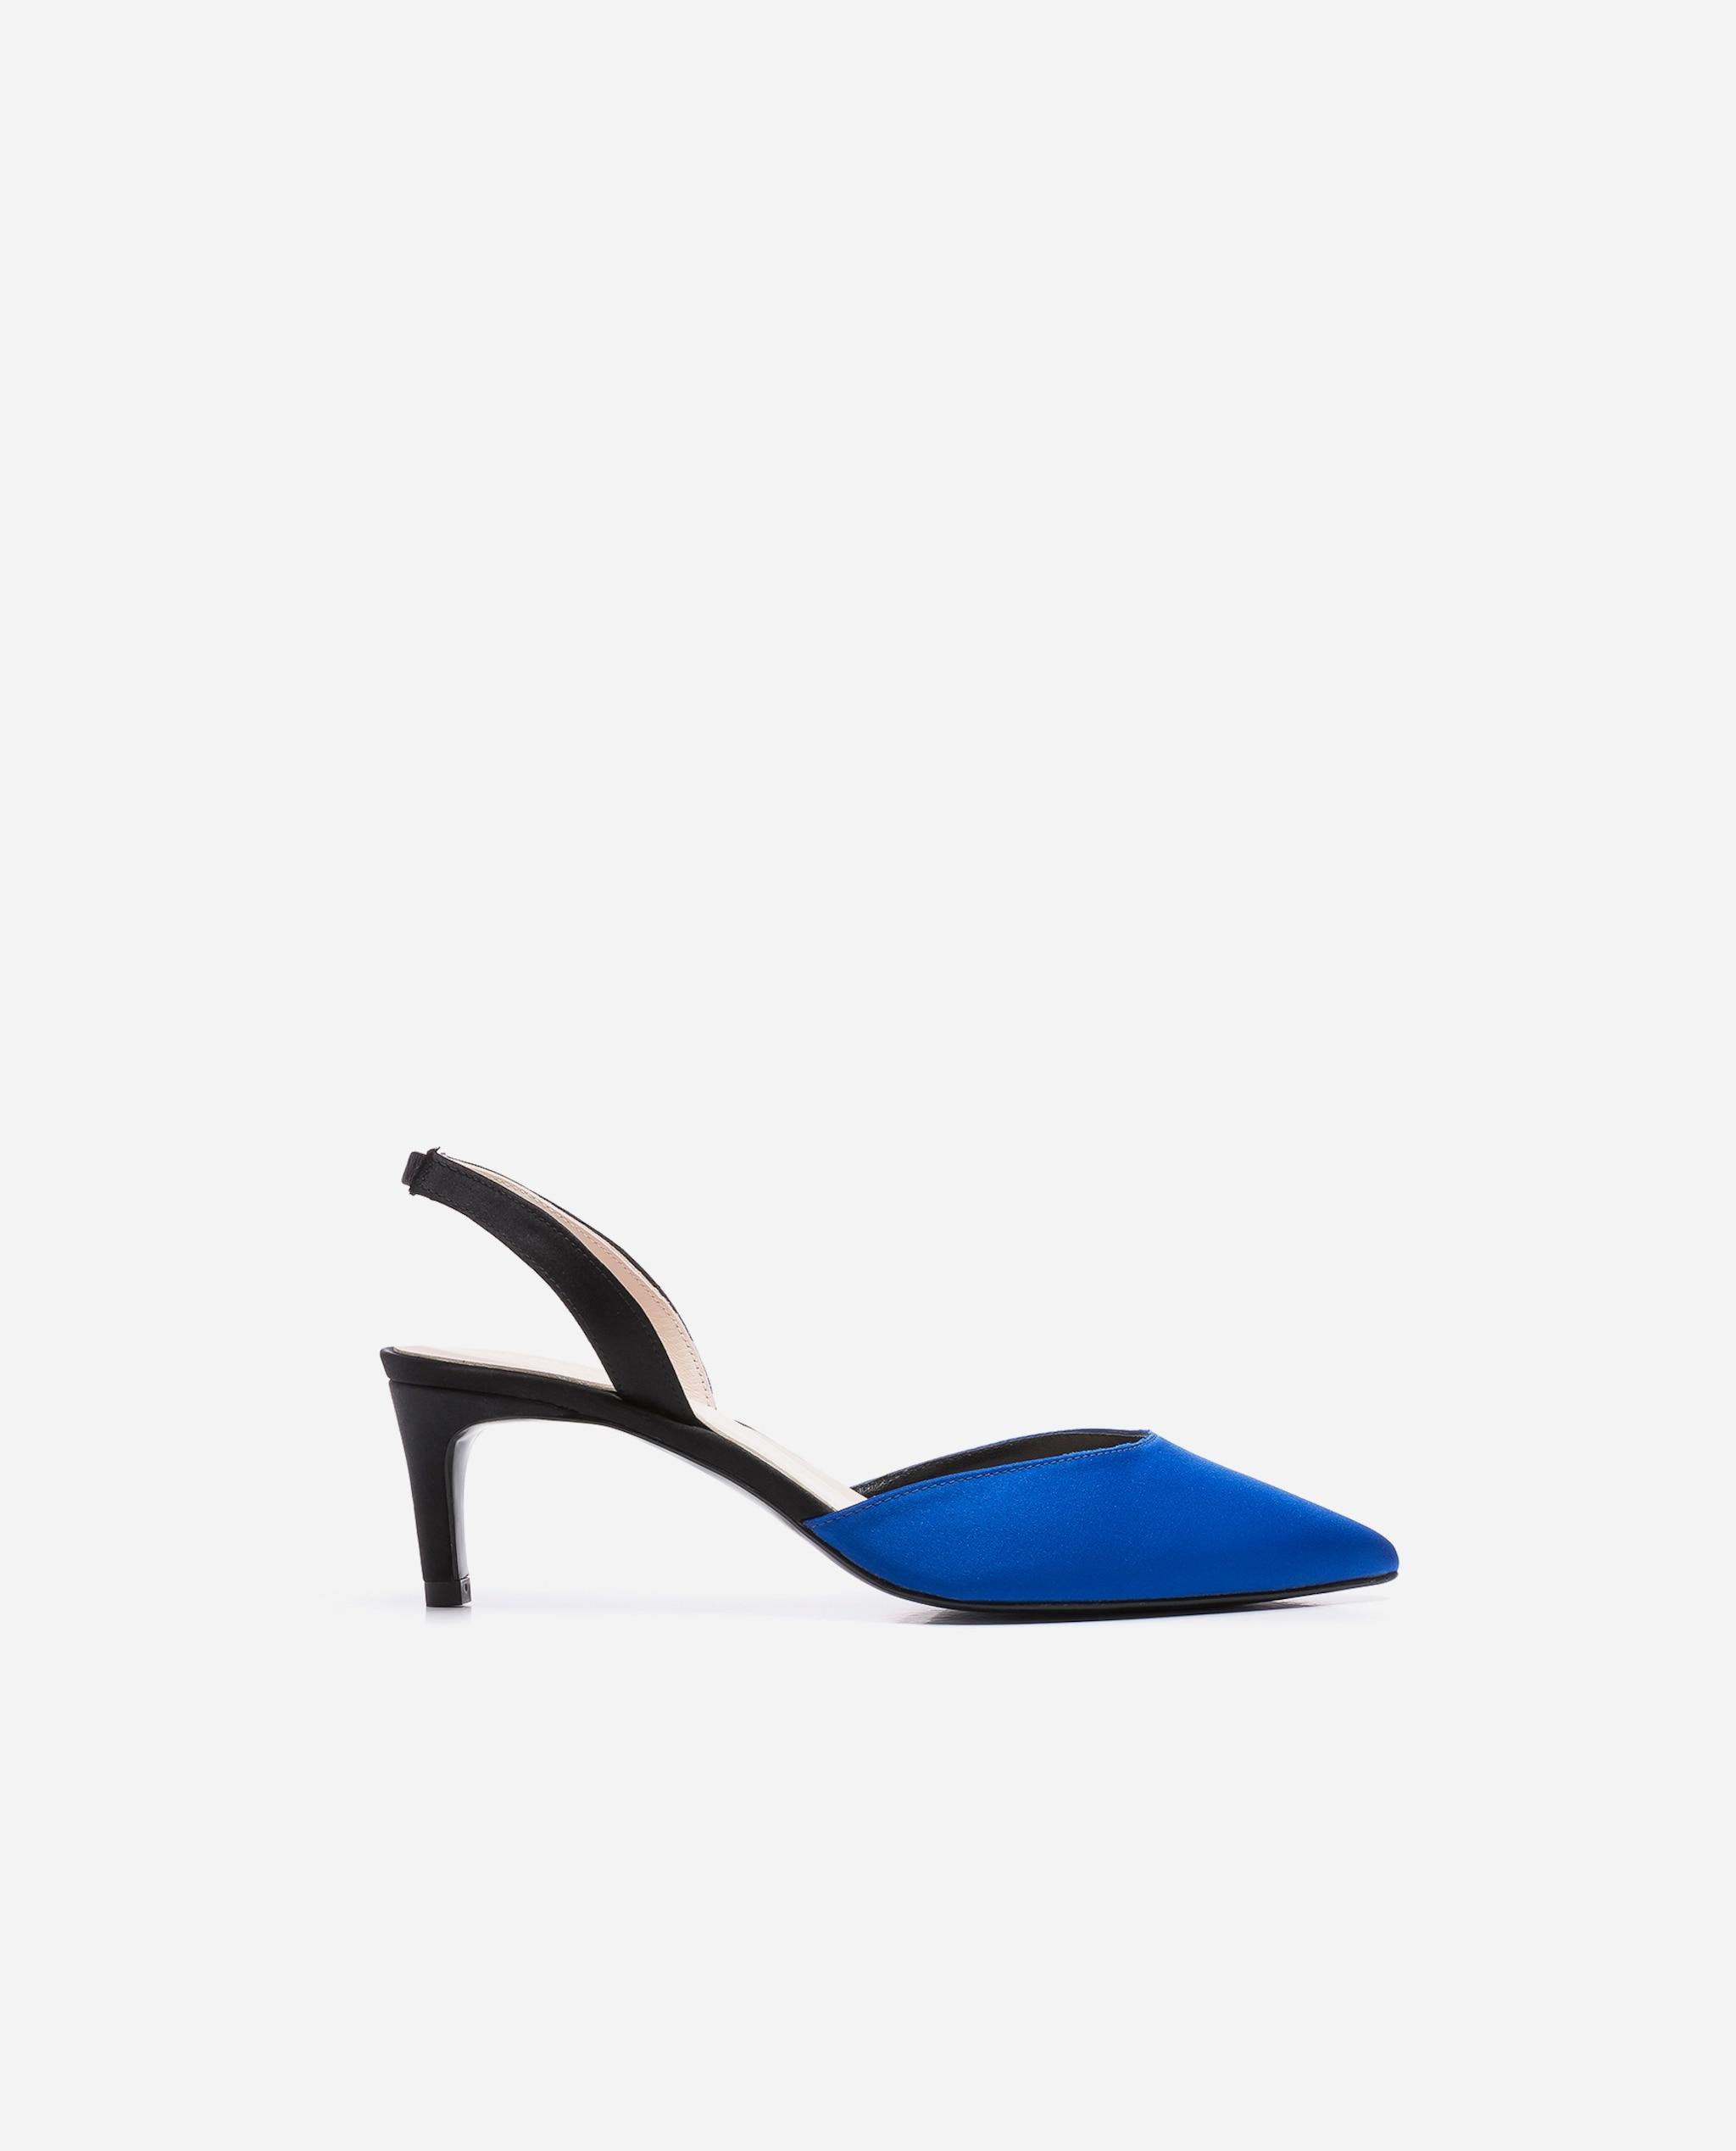 Emilia Textile Blue